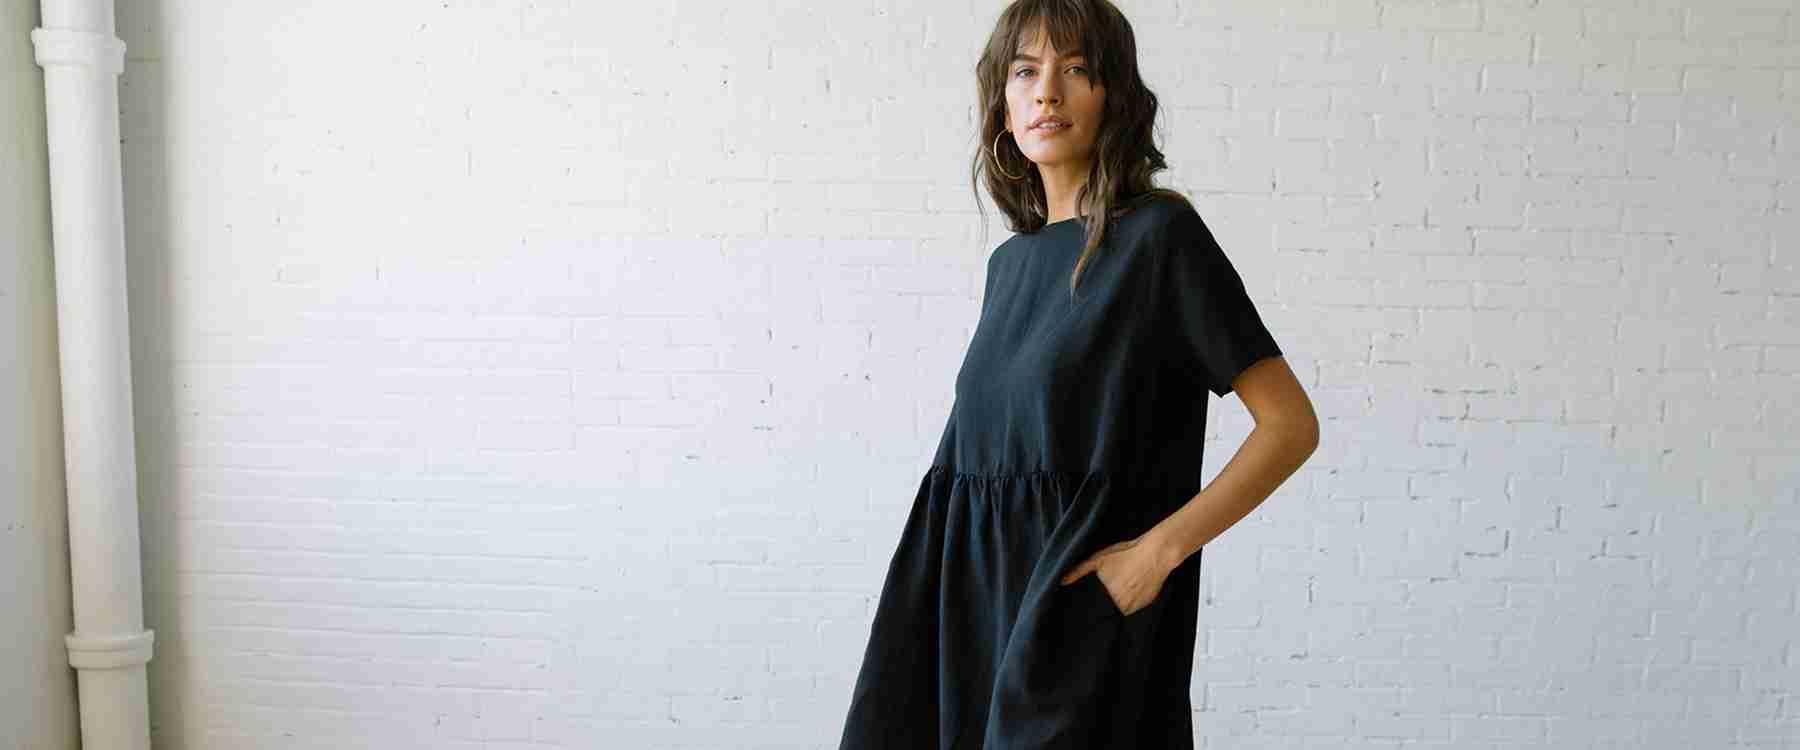 The Perfect Linen Dress - The Nico Caroline Print